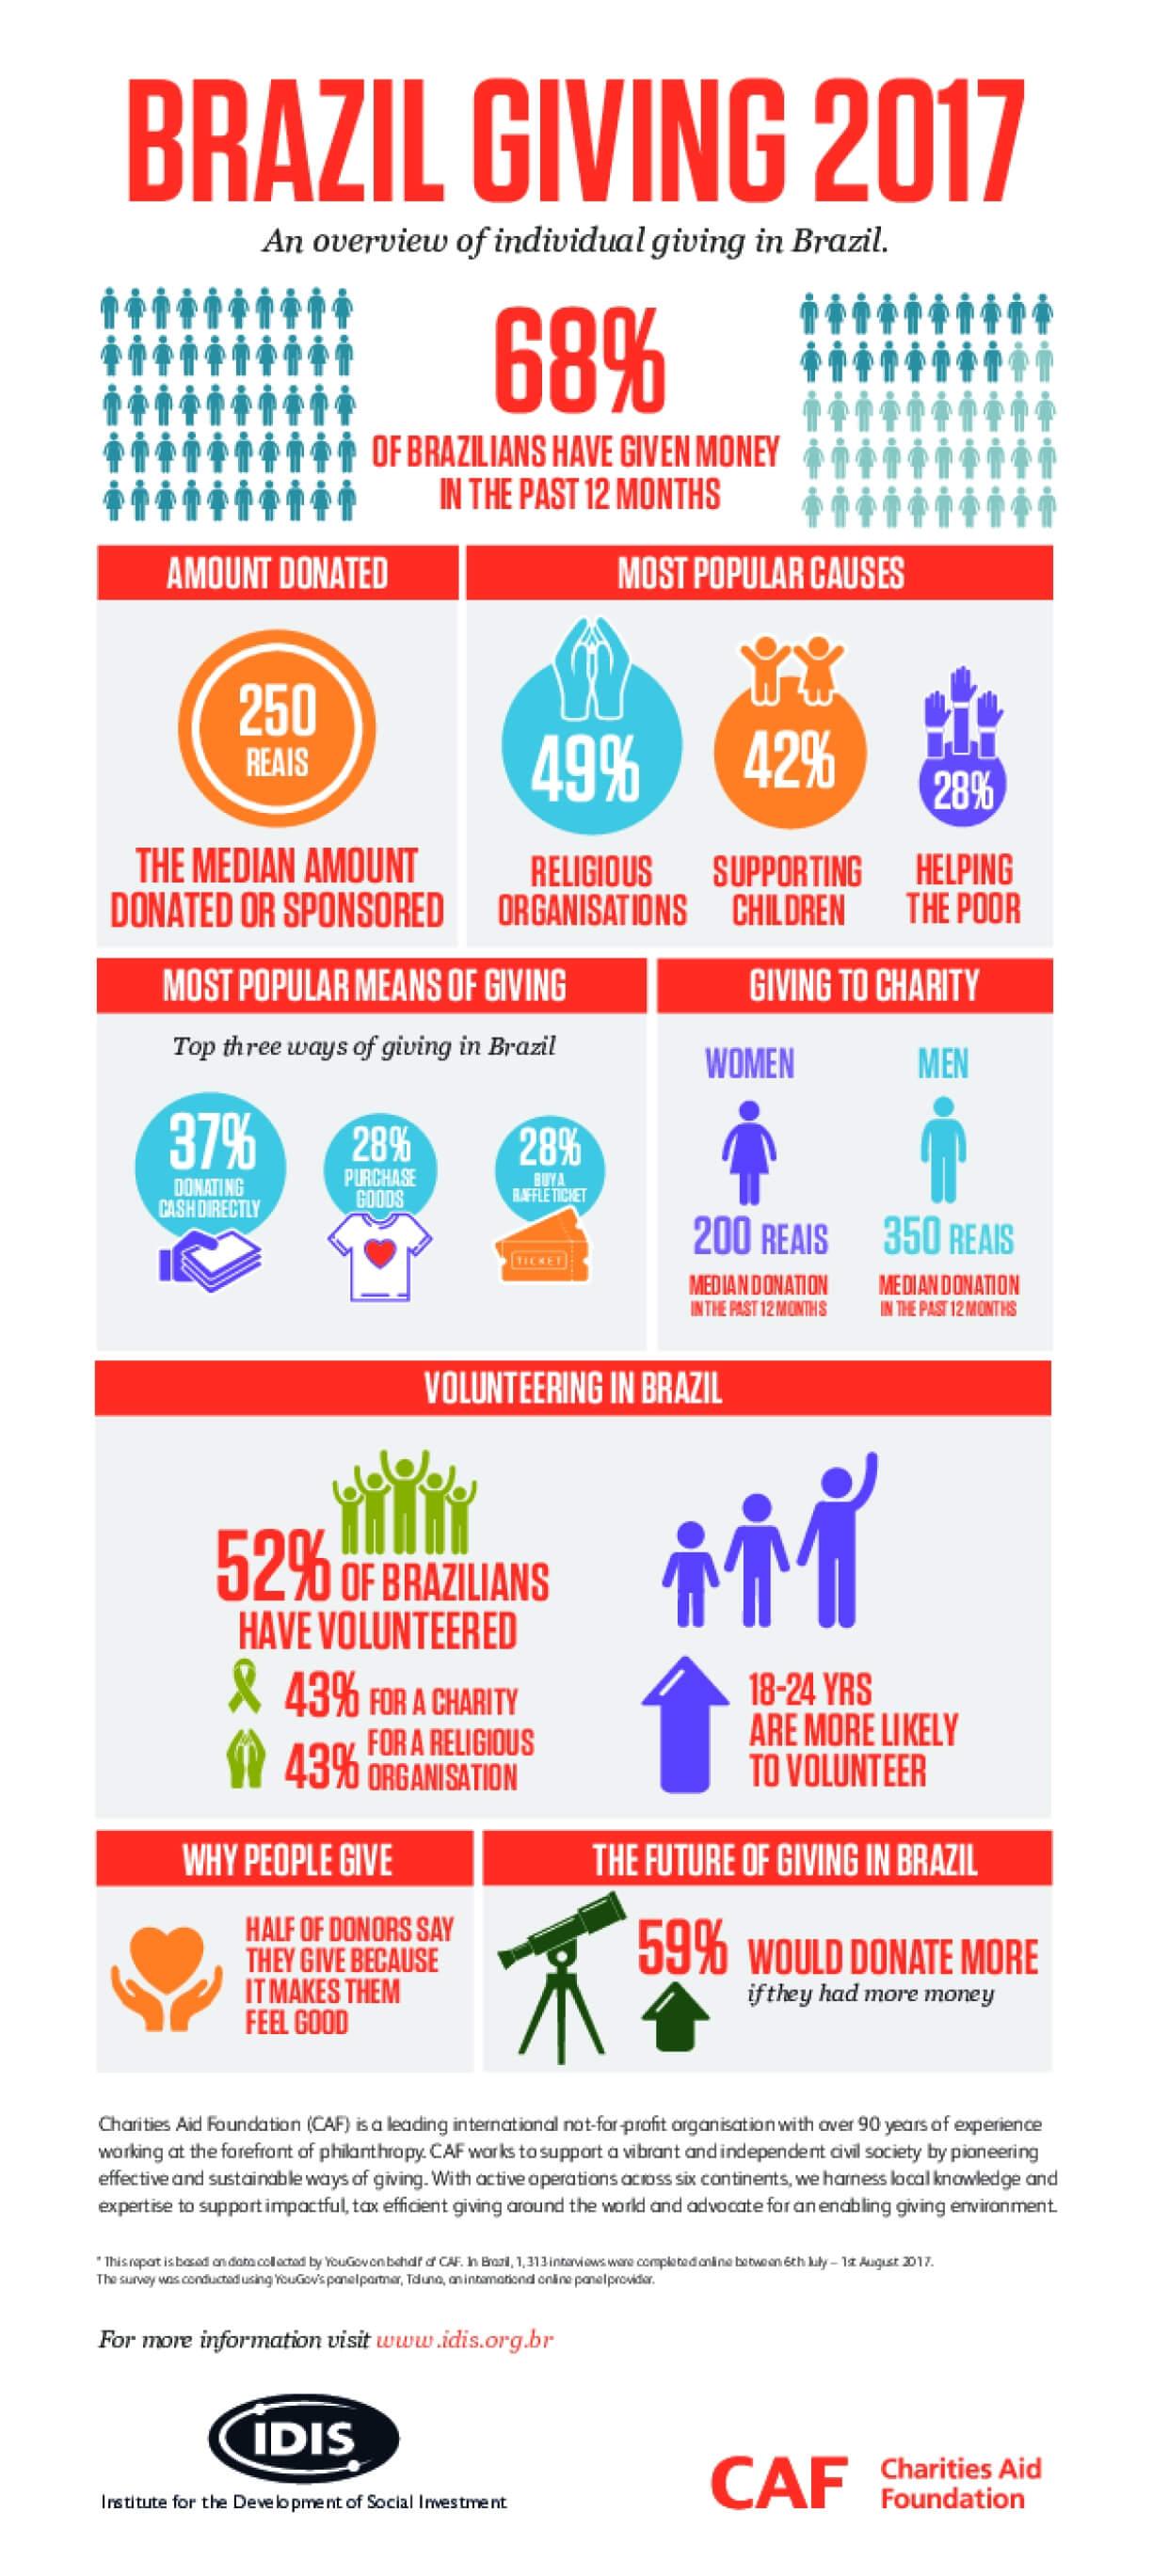 Brazil Giving 2017 - Infographic